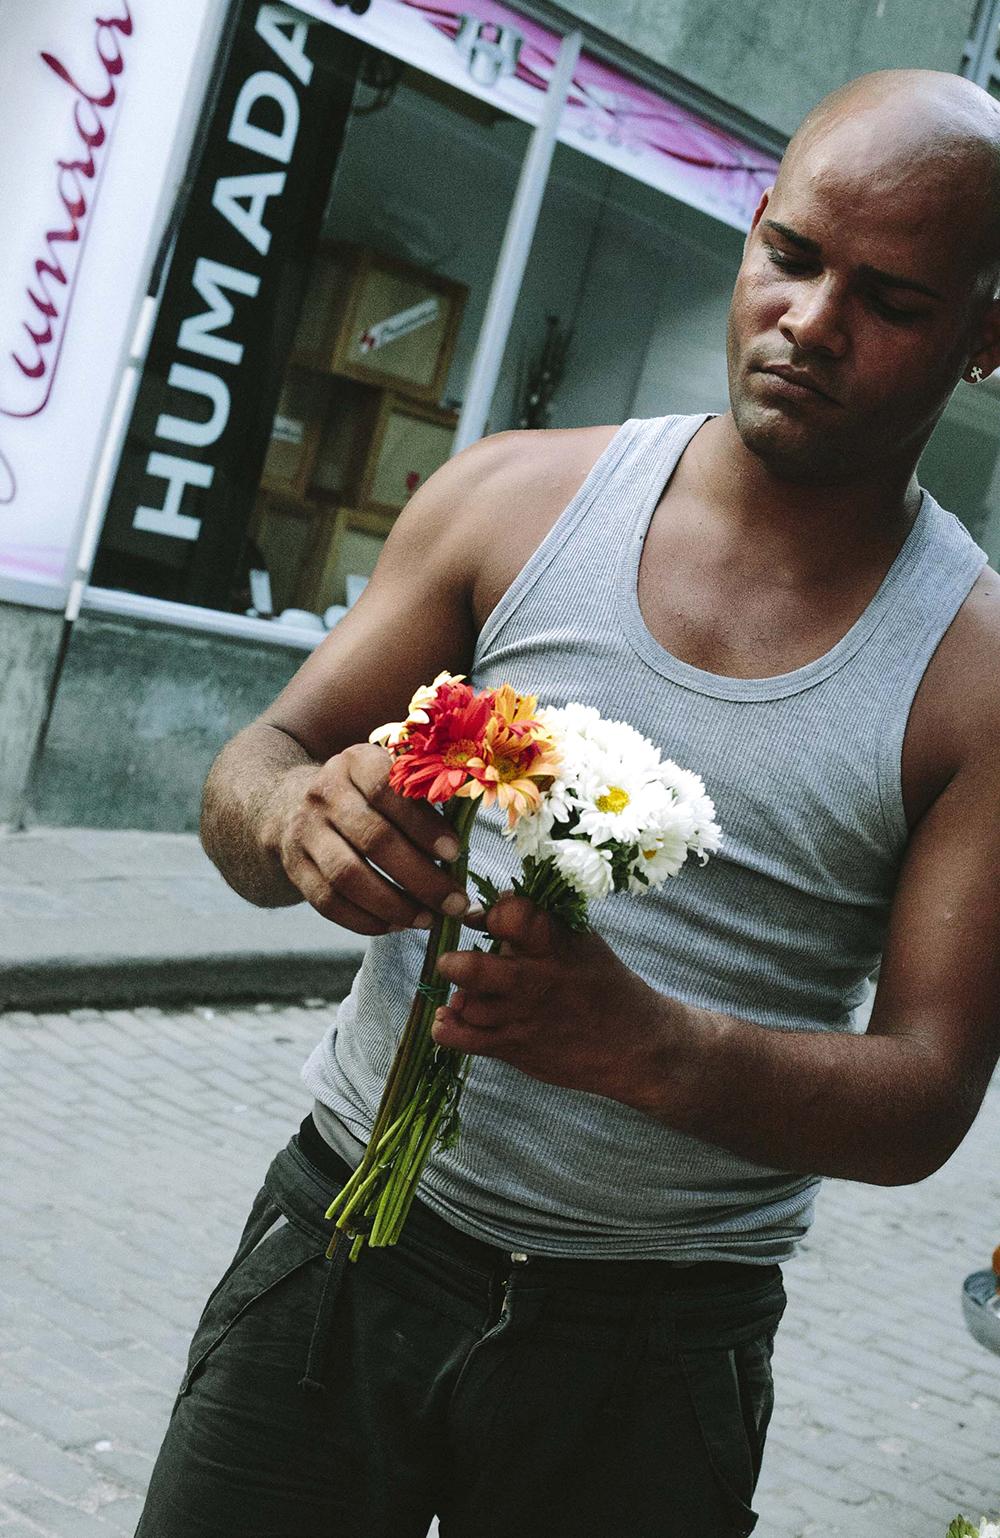 cuba_havana_felicidad_de_lucas_documentary_025.jpg